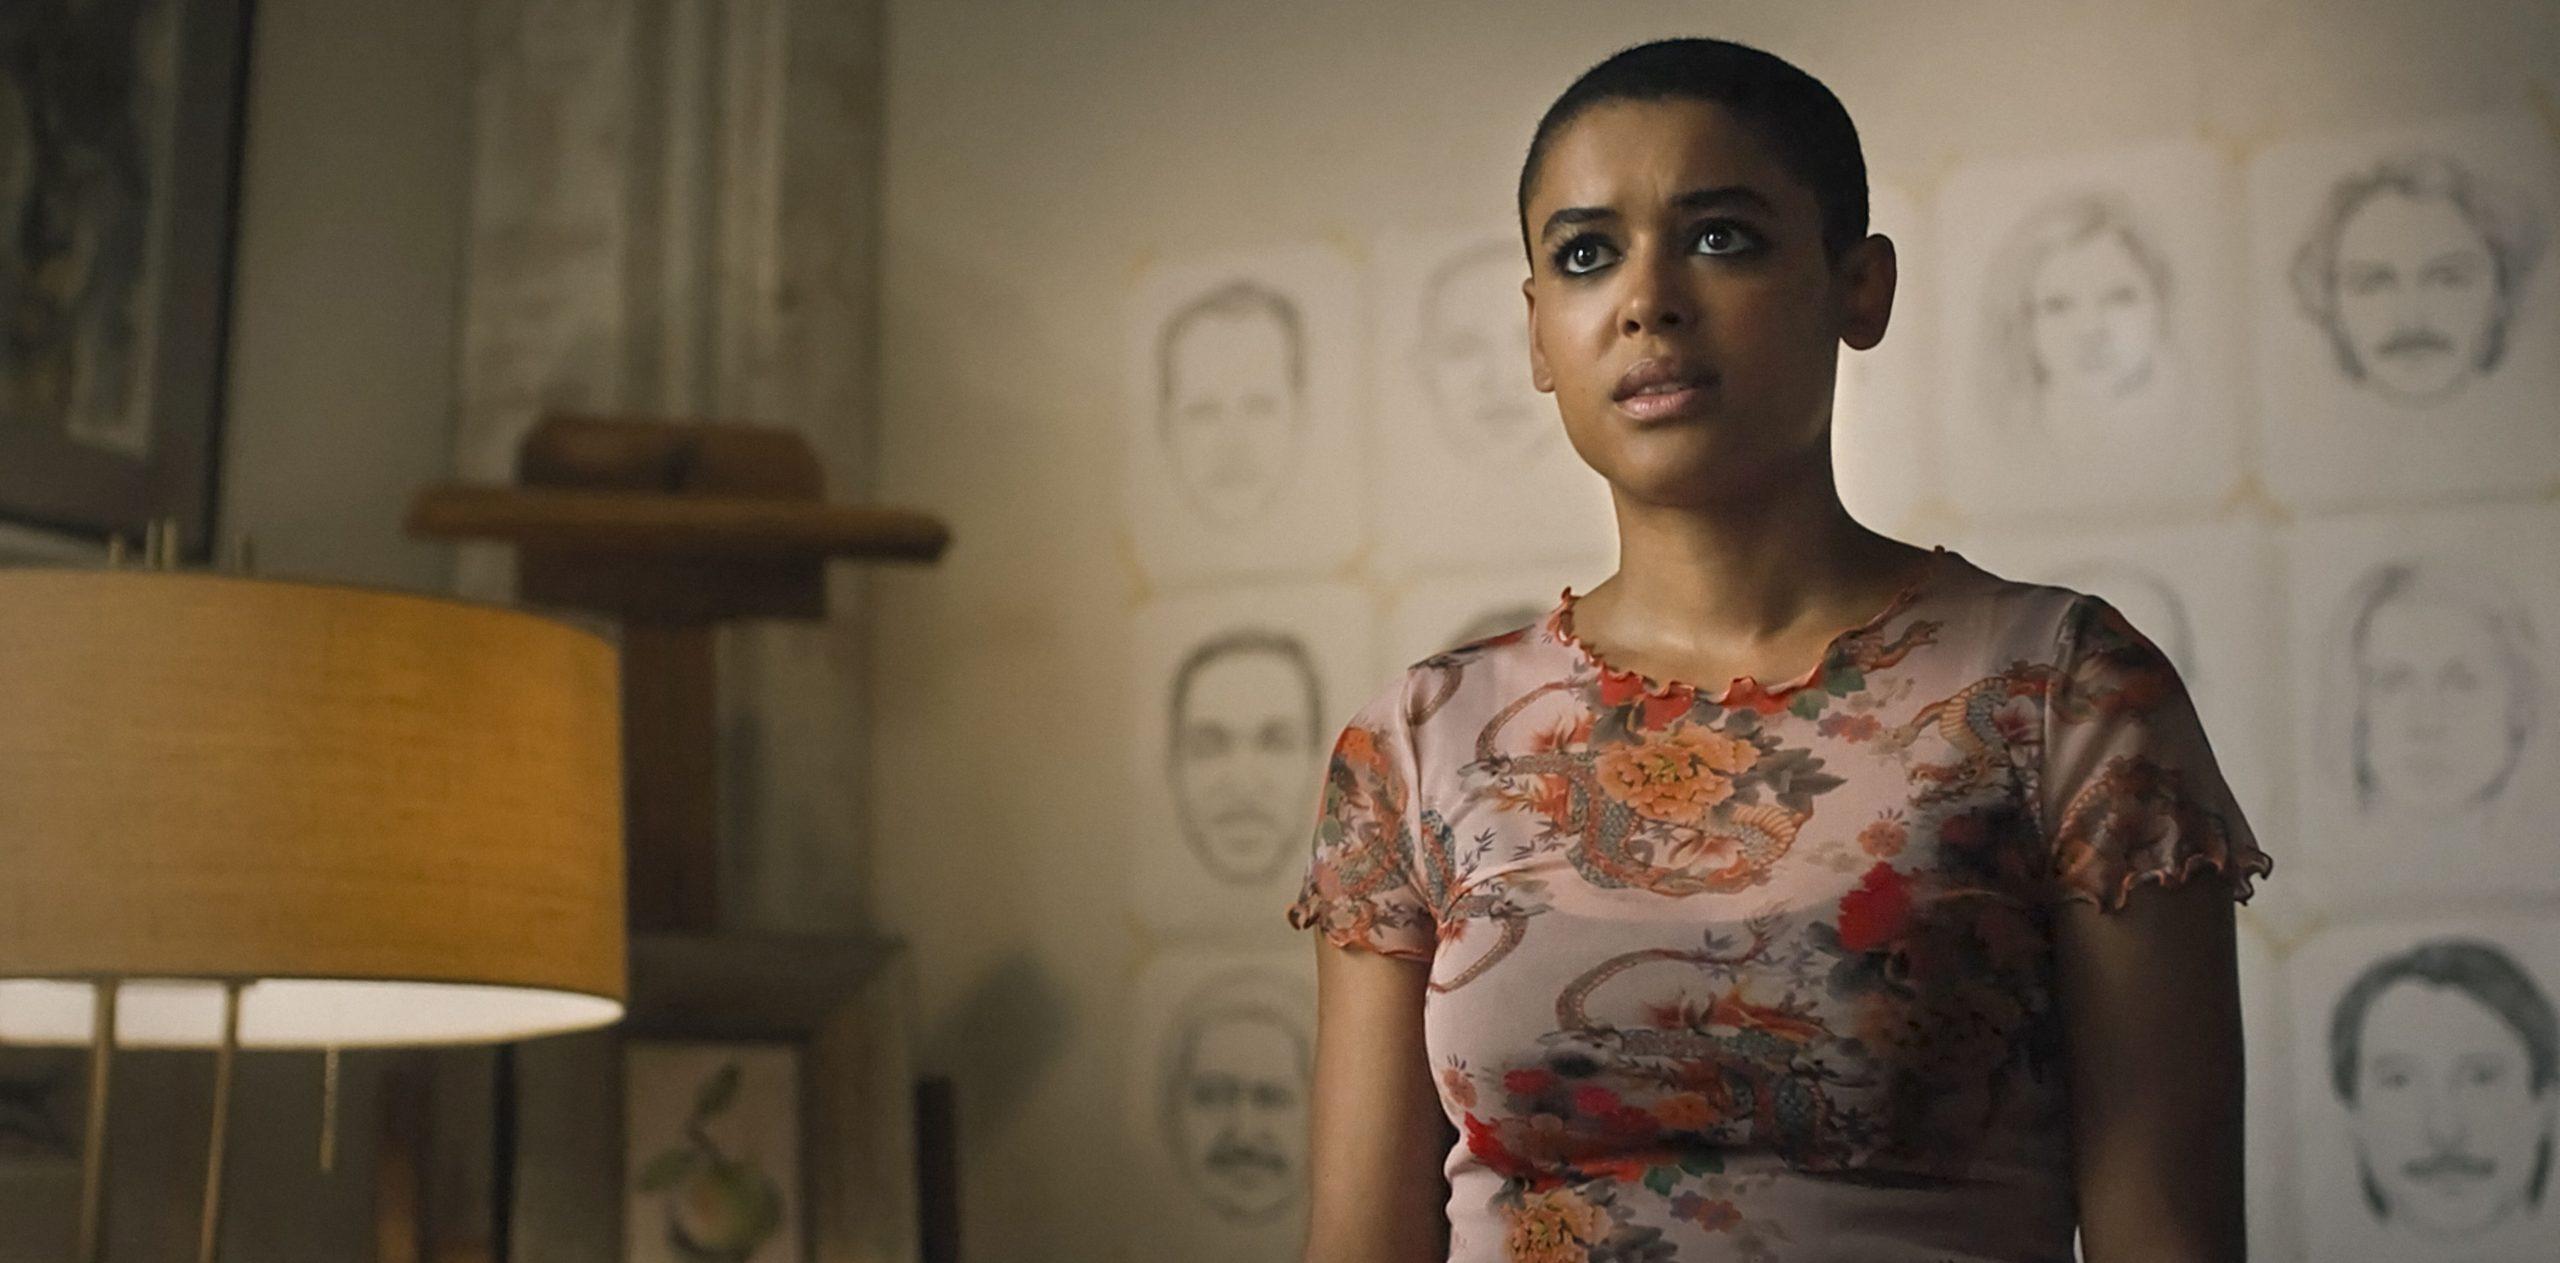 [Interview] Actress Jordan Alexander for SACRED LIES: THE SINGING BONES